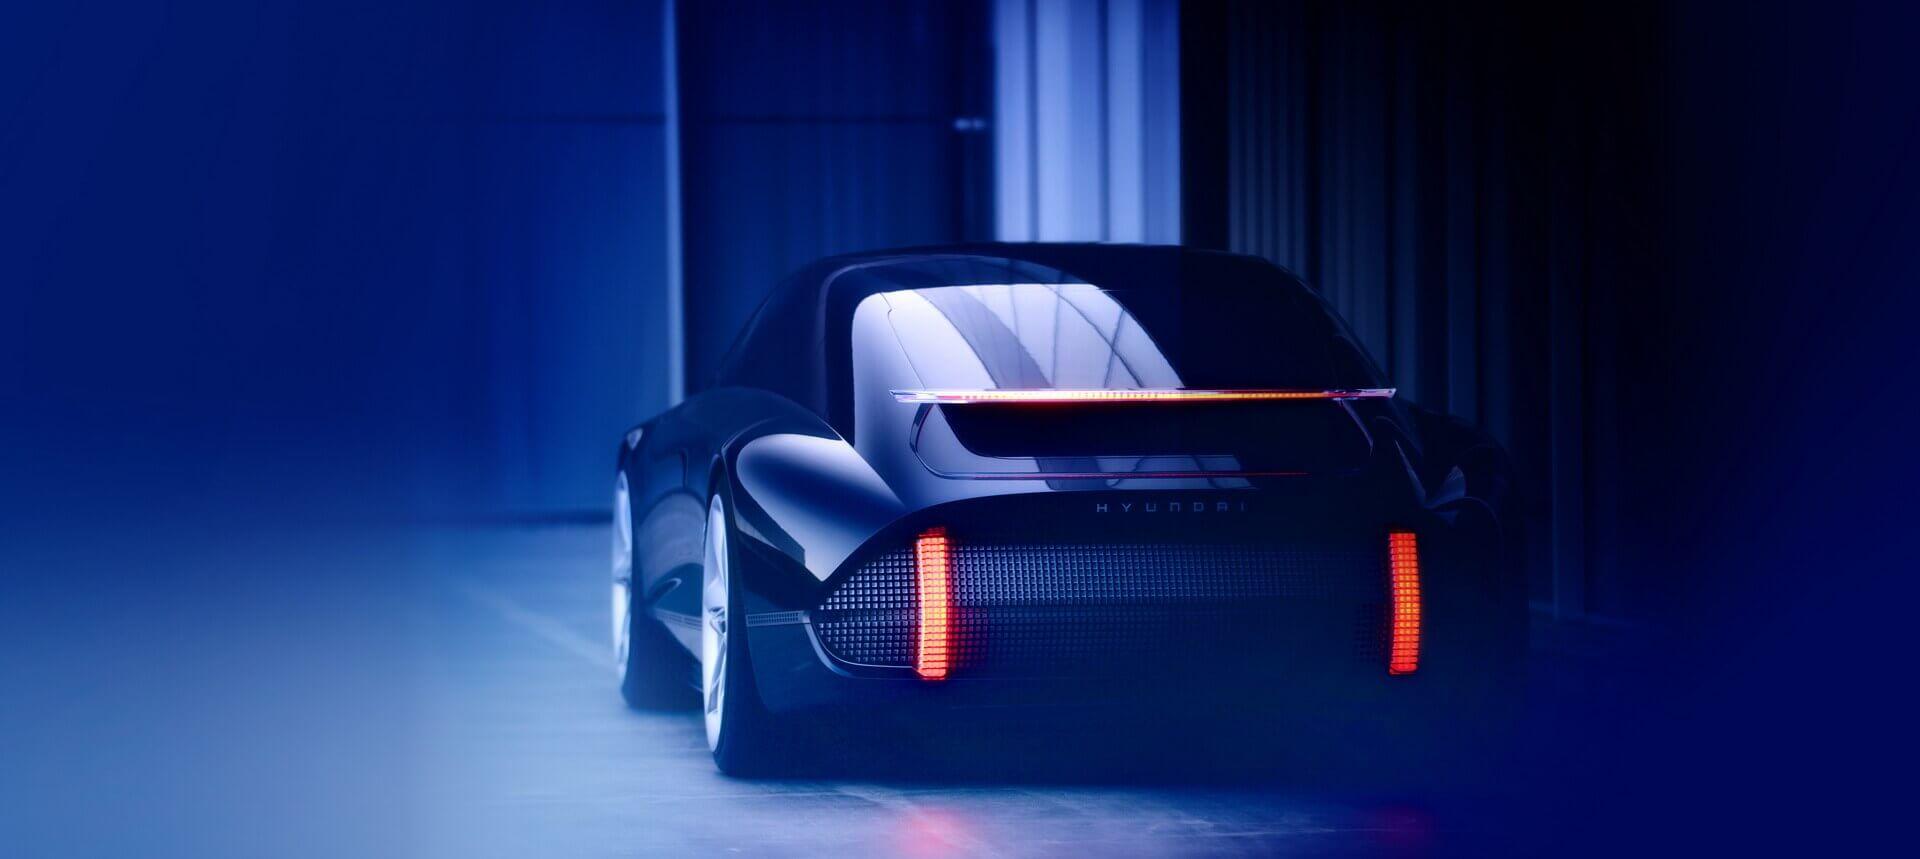 Hyundai «Prophecy» EV